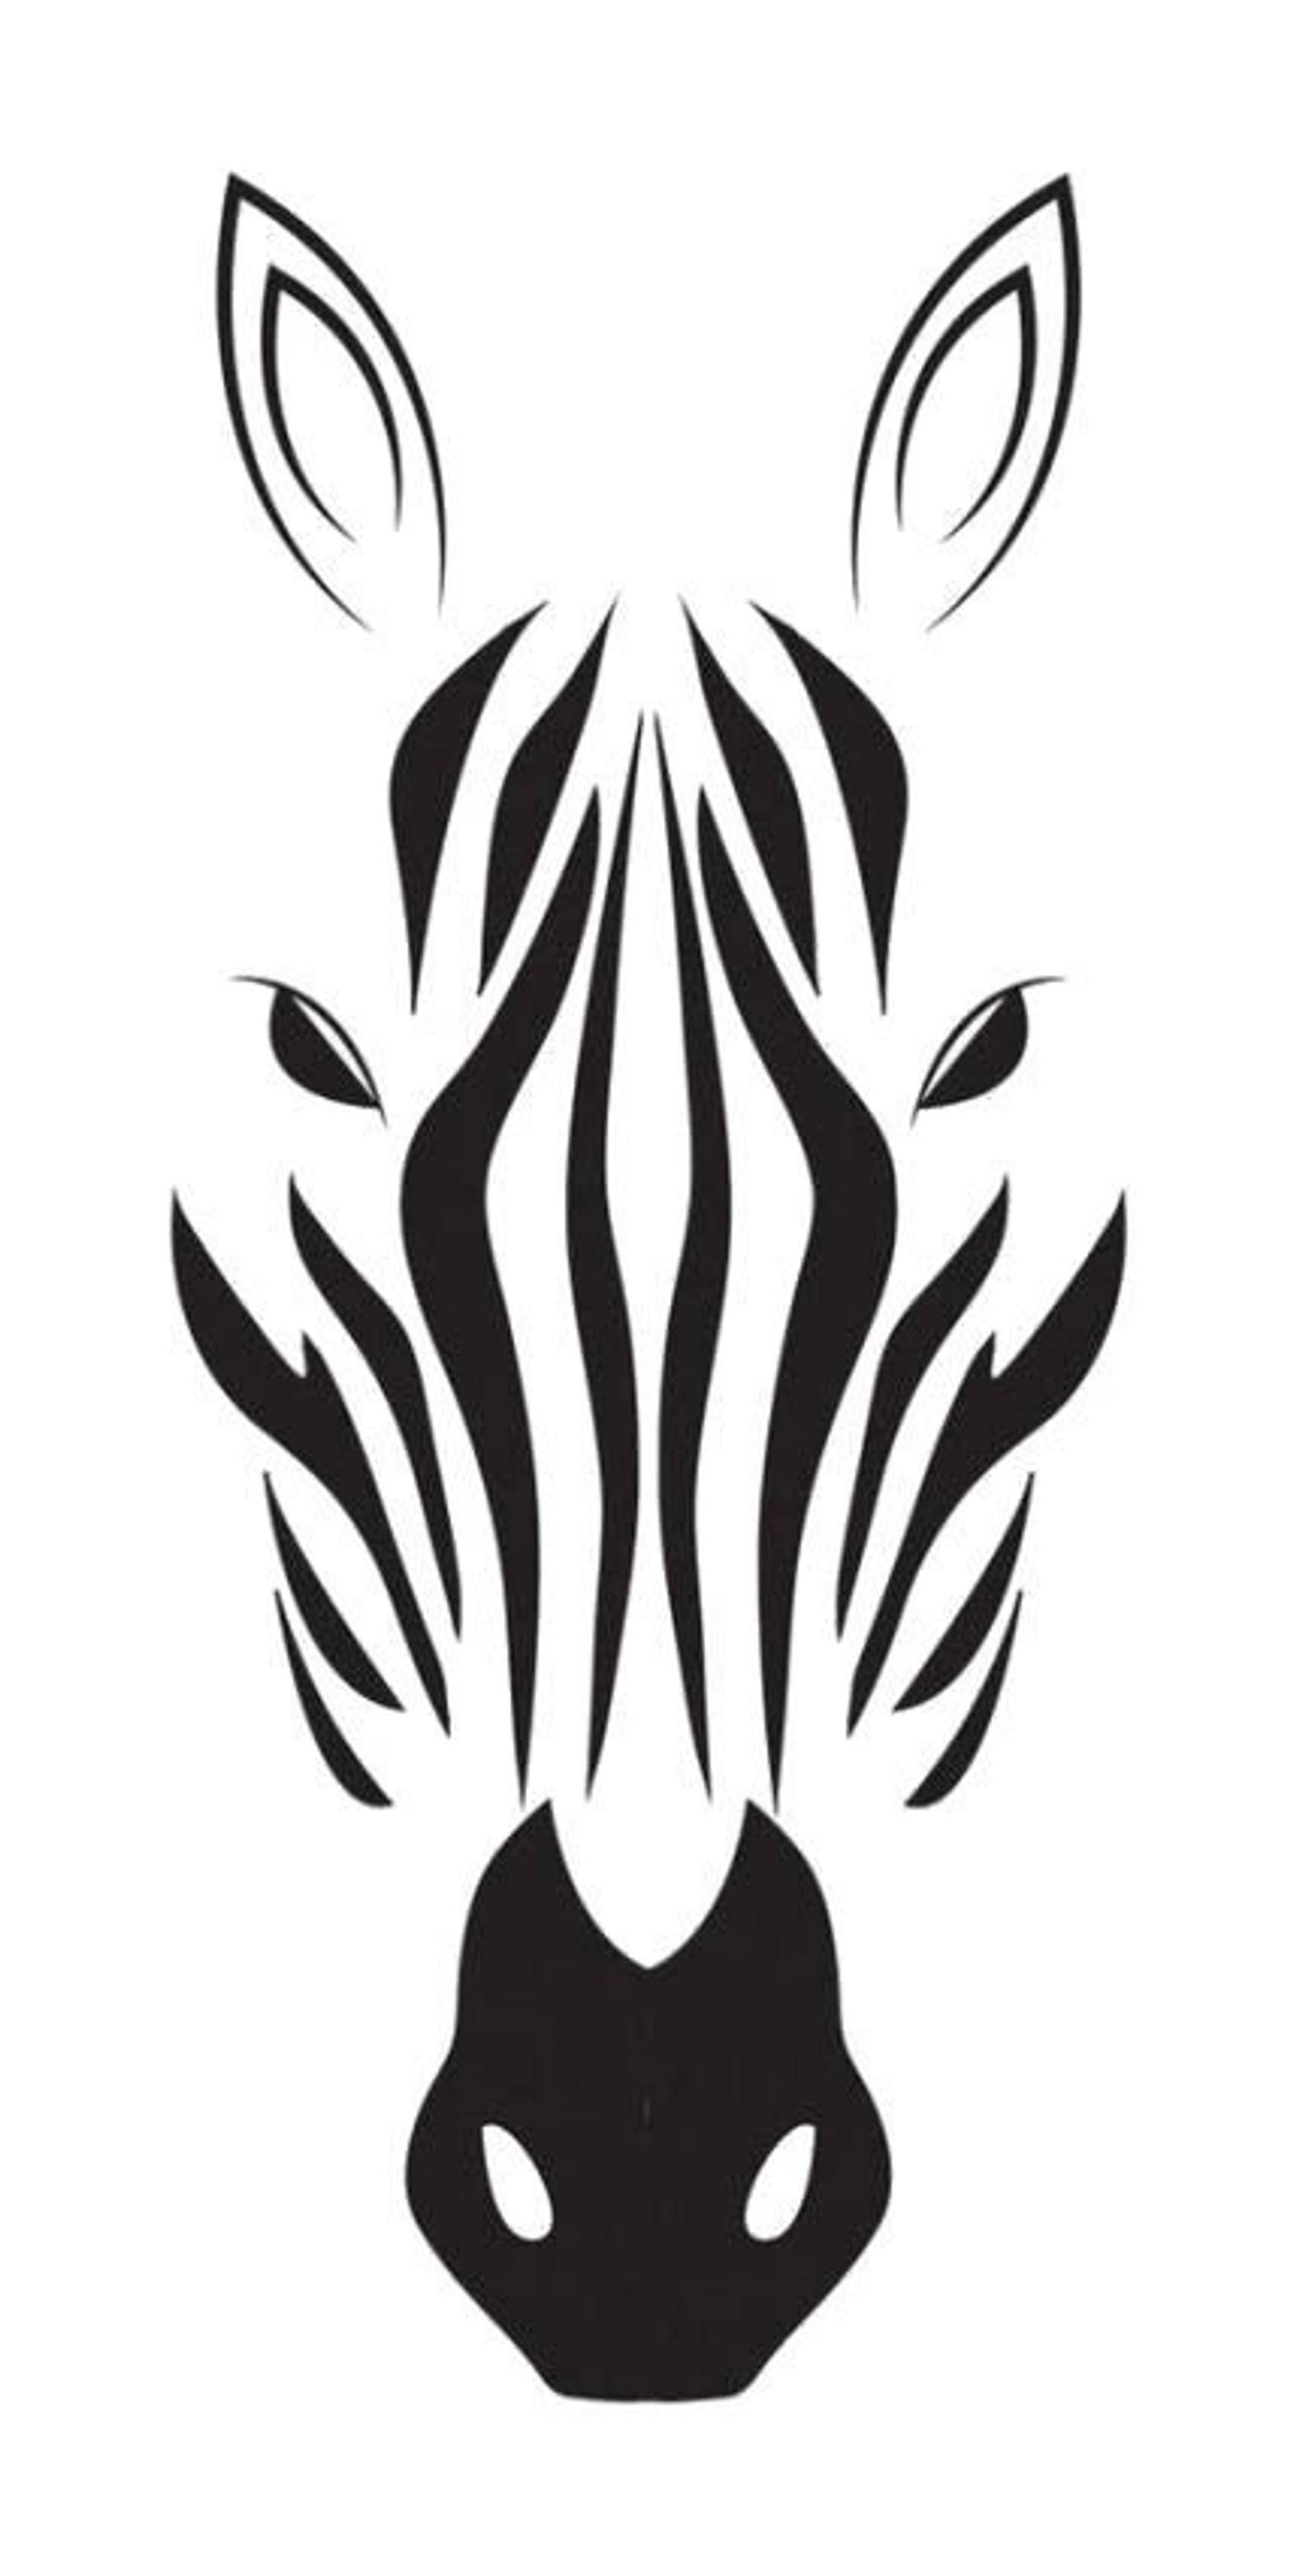 Zebra Face Svg Png Jpg Cricut Silhouette Zoo Animal In 2020 Zebra Drawing Zebra Face Stencil Art